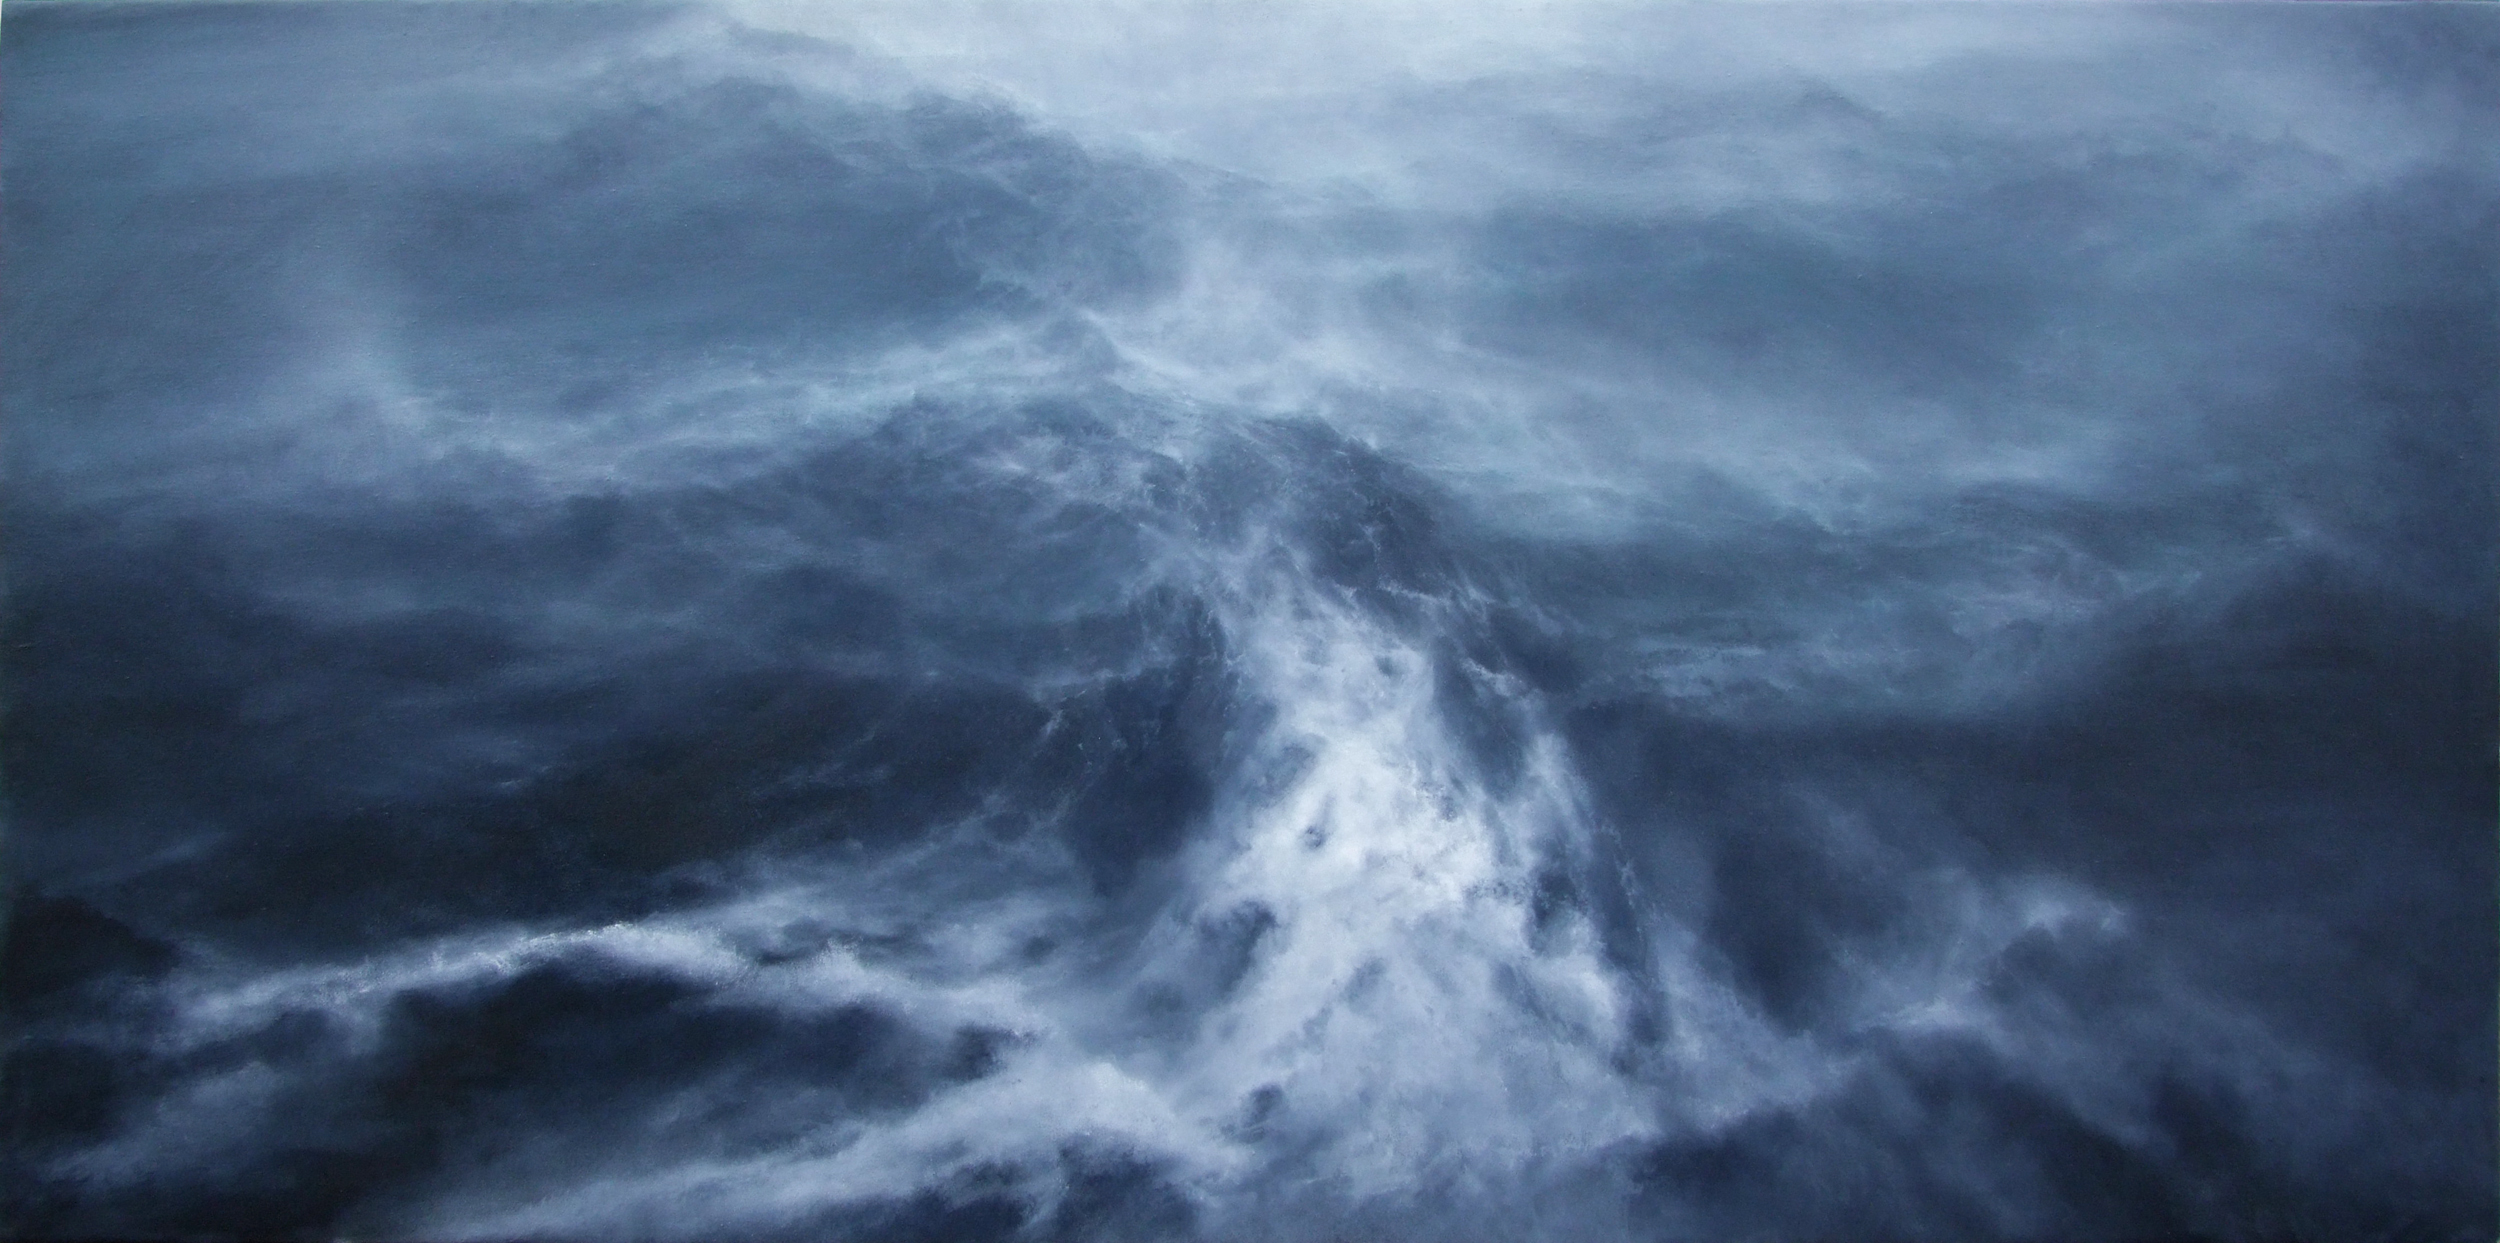 ilric_shetland-TheSurge